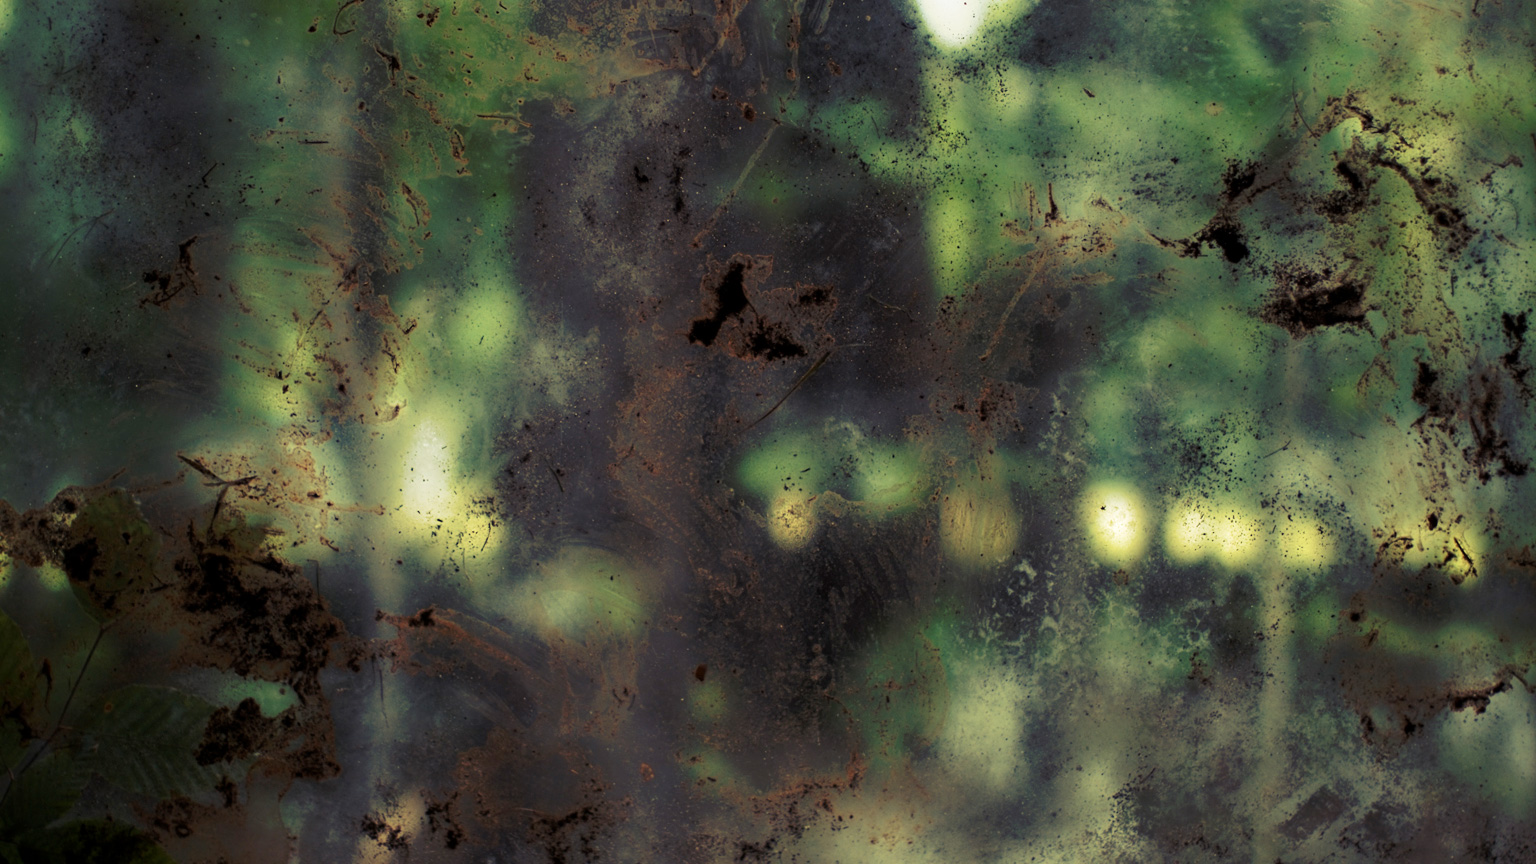 Conspiracy of Silence, Window 4 #383, 2009, C-Print